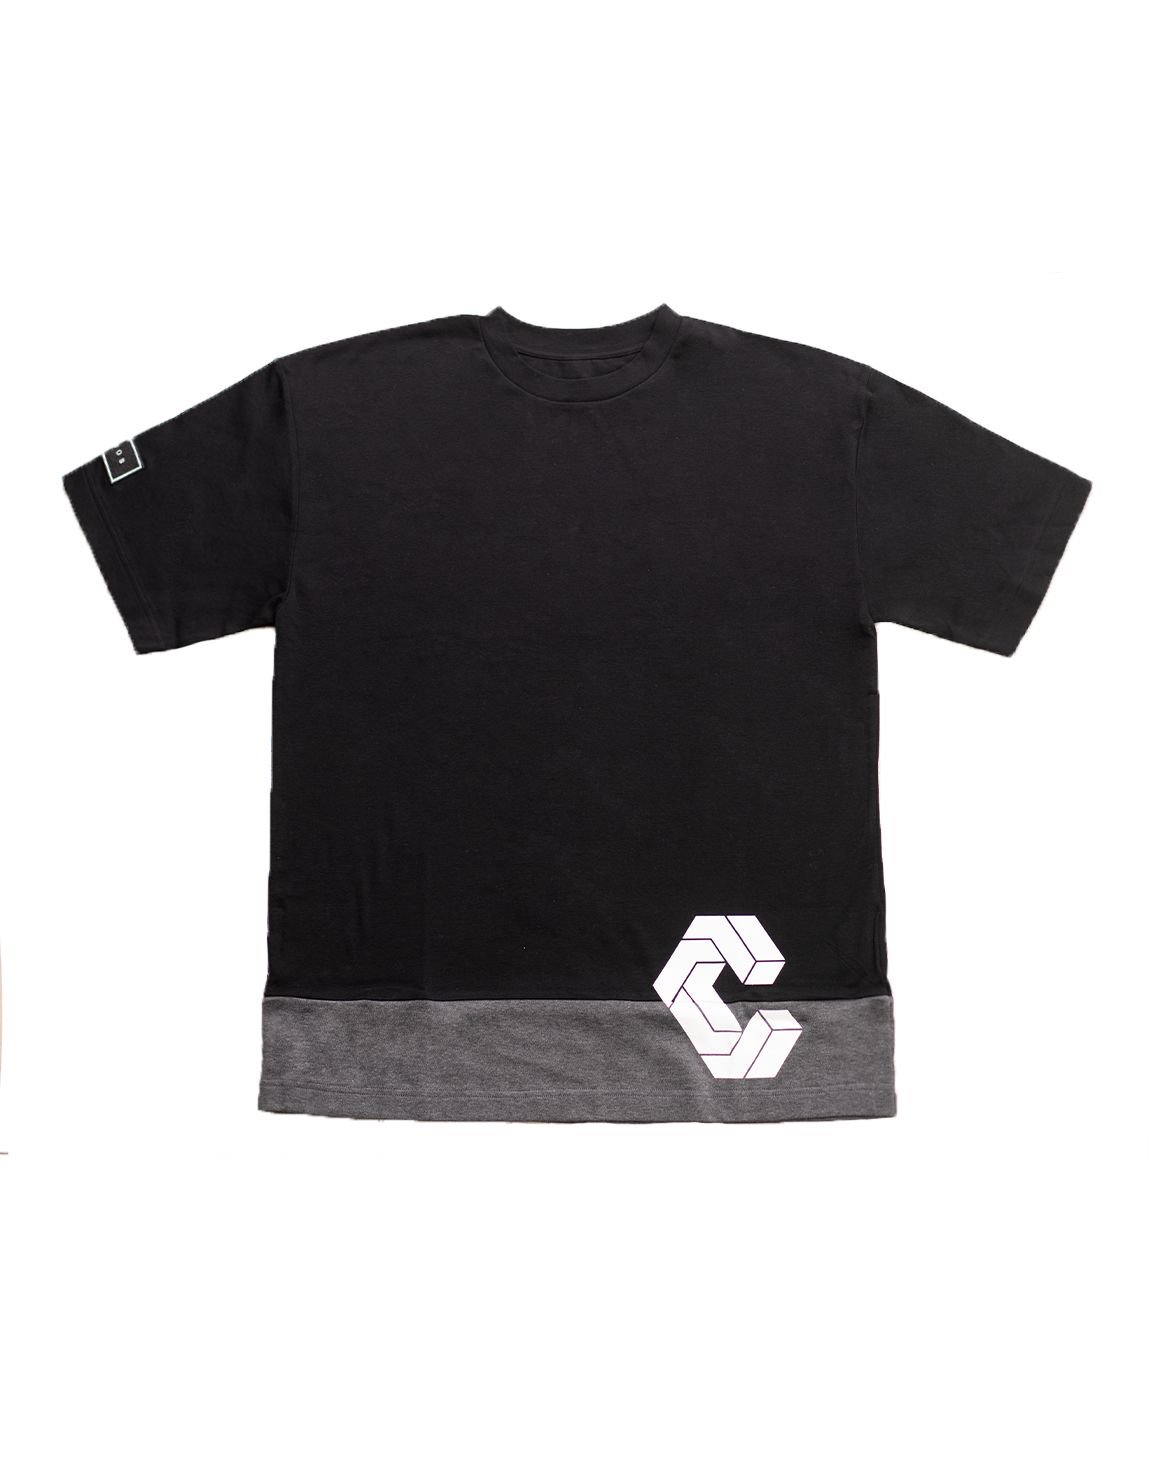 CRONOS MODE SIDE LOGO OVER SIZE T-SHIRTS【BLACK×C.GRAY】